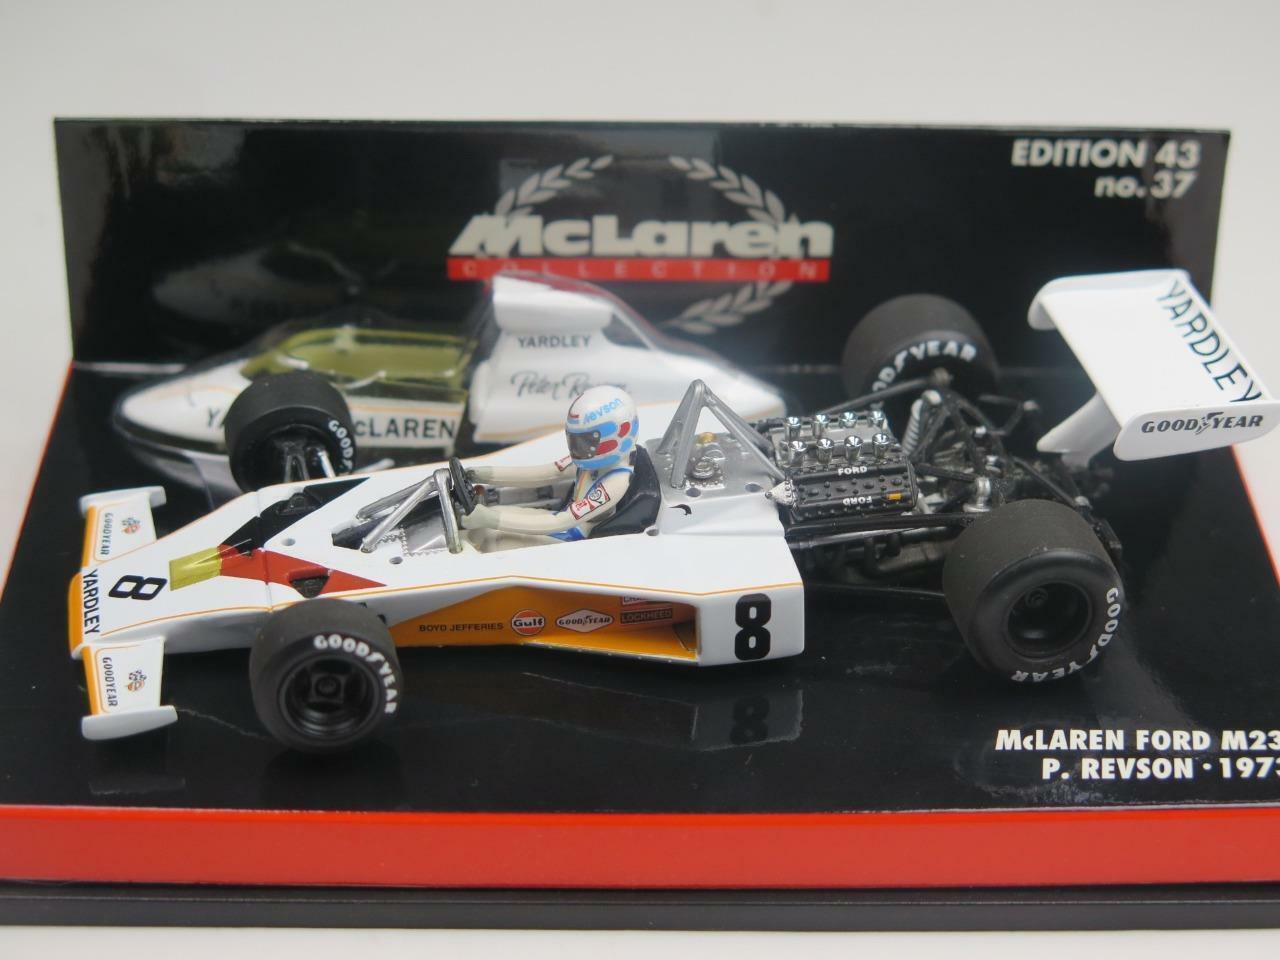 Minichamps 1 43 Formula 1 Yardley McLaren McLaren McLaren M23 como nuevo Peter Revson 1973  envío gratis